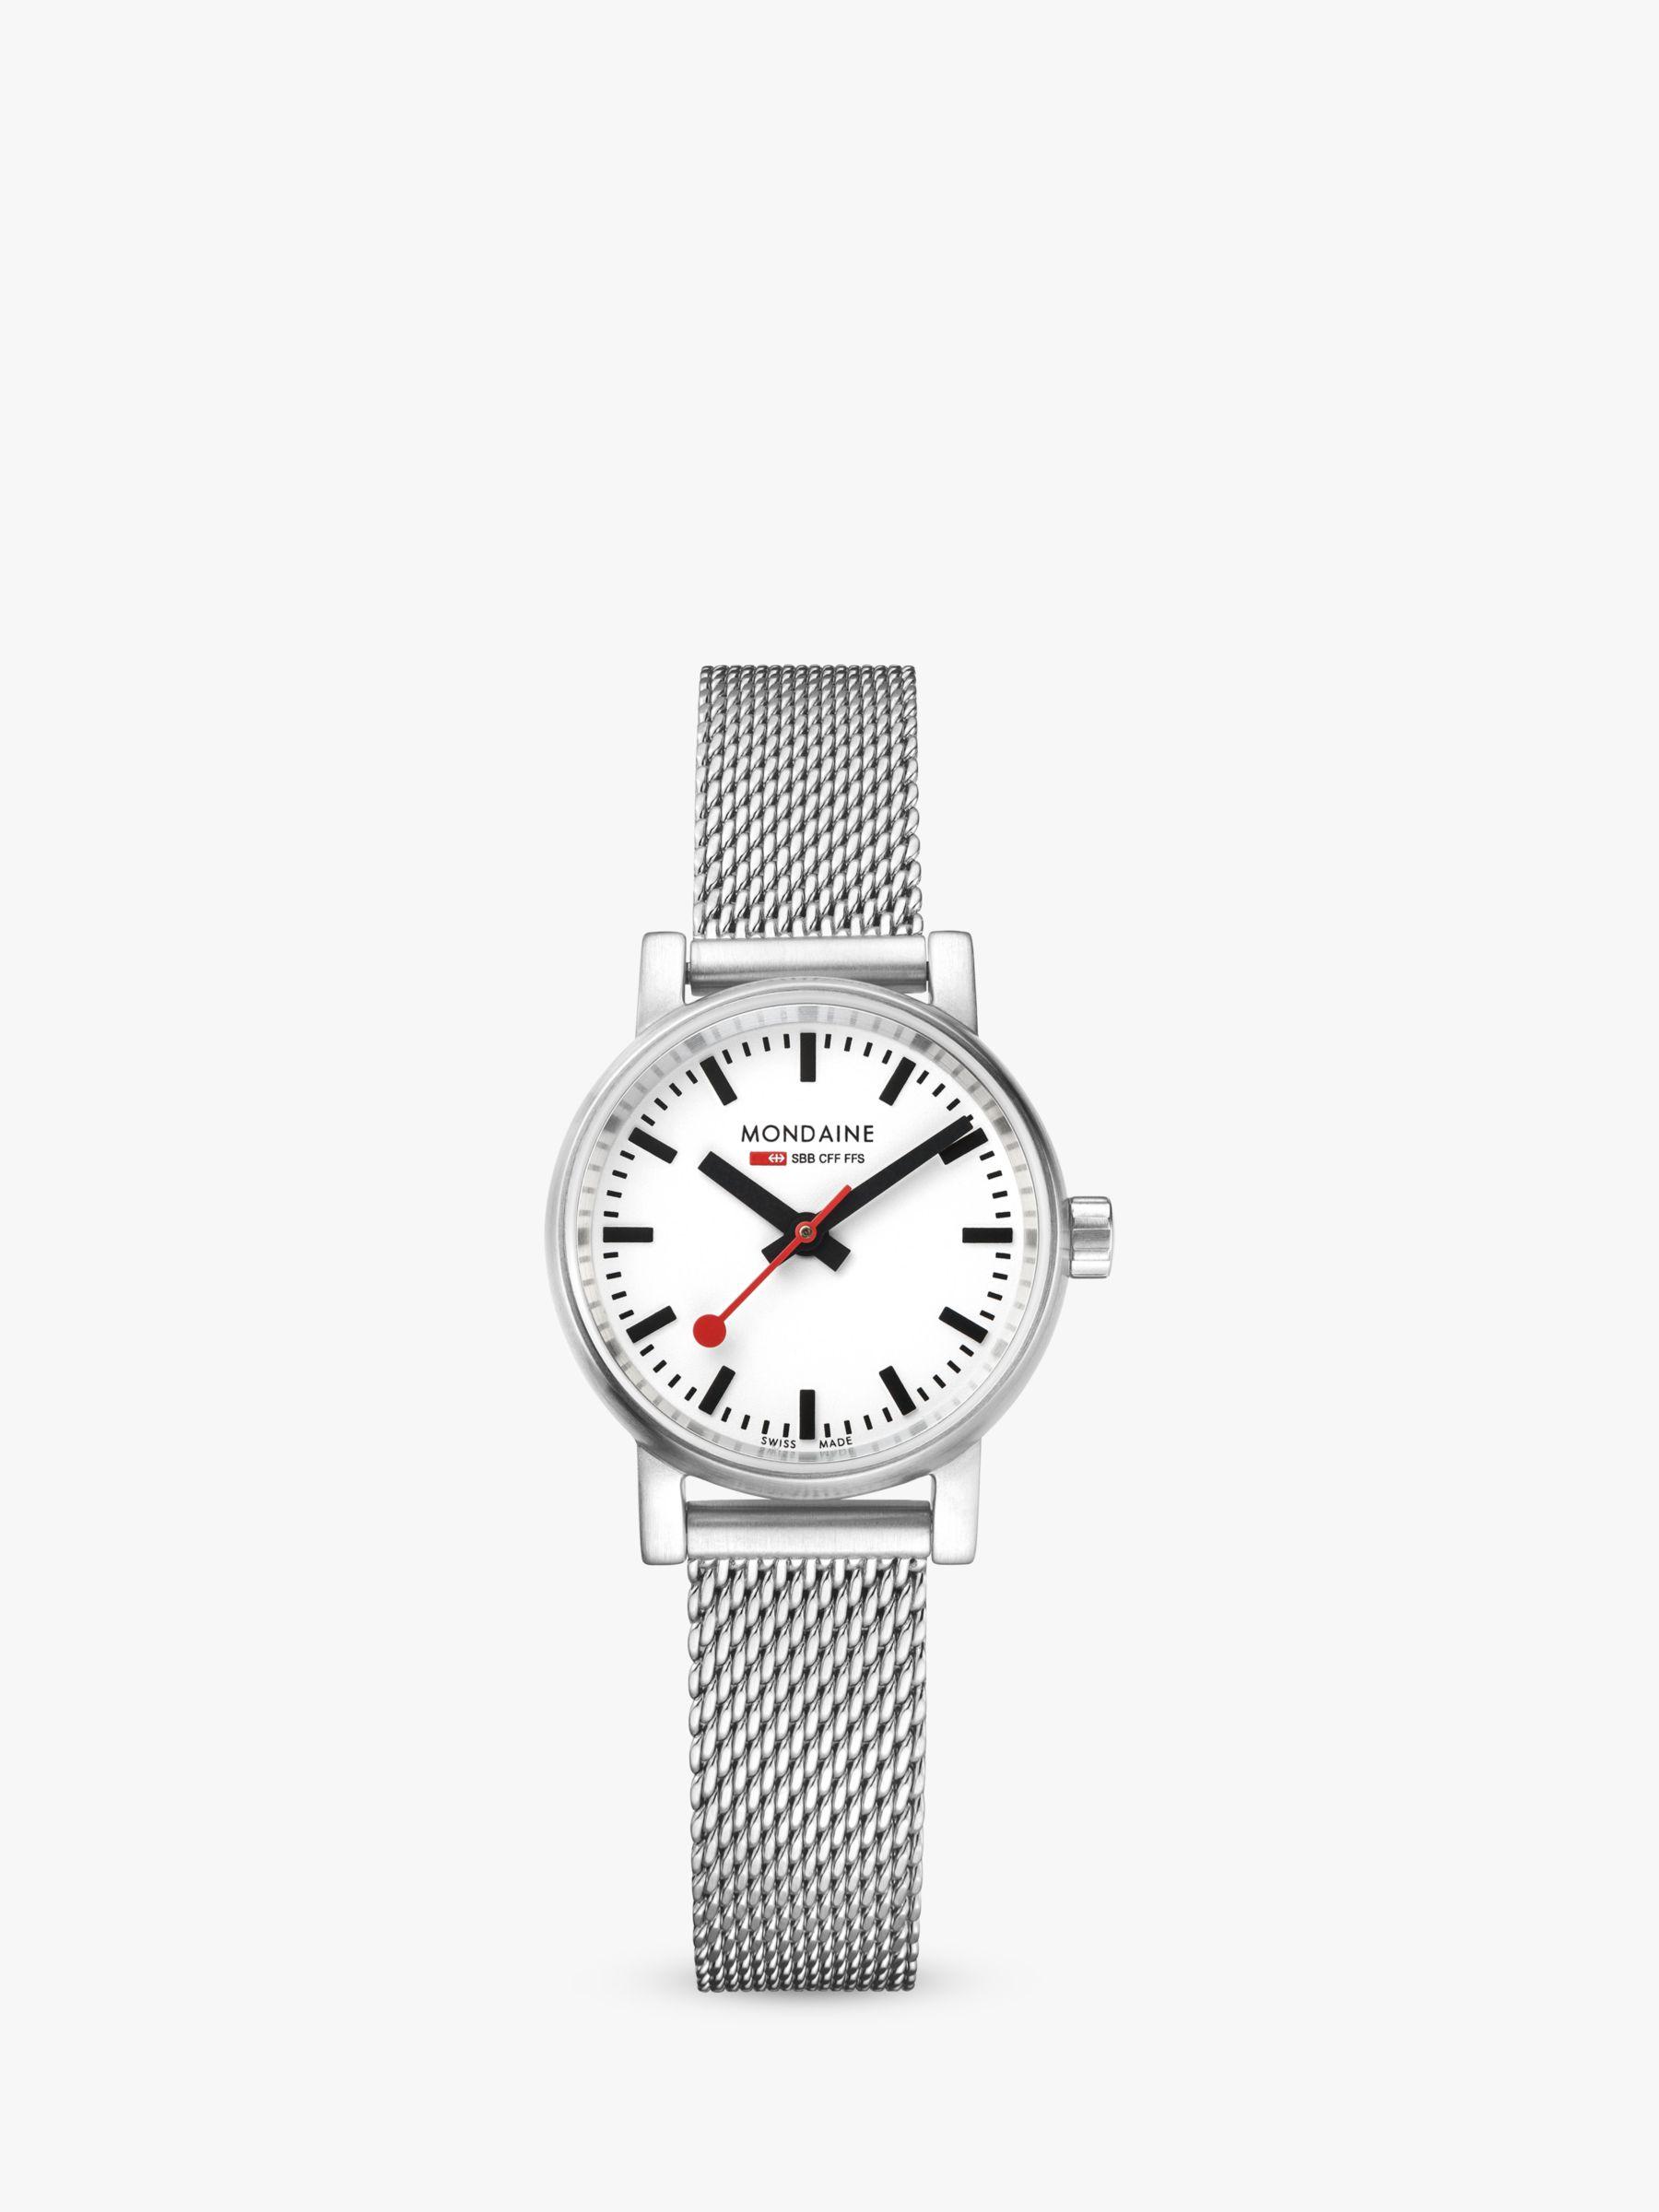 Mondaine Mondaine MSE.26110.SM Unisex Evo 2 Mesh Bracelet Strap Watch, Silver/White